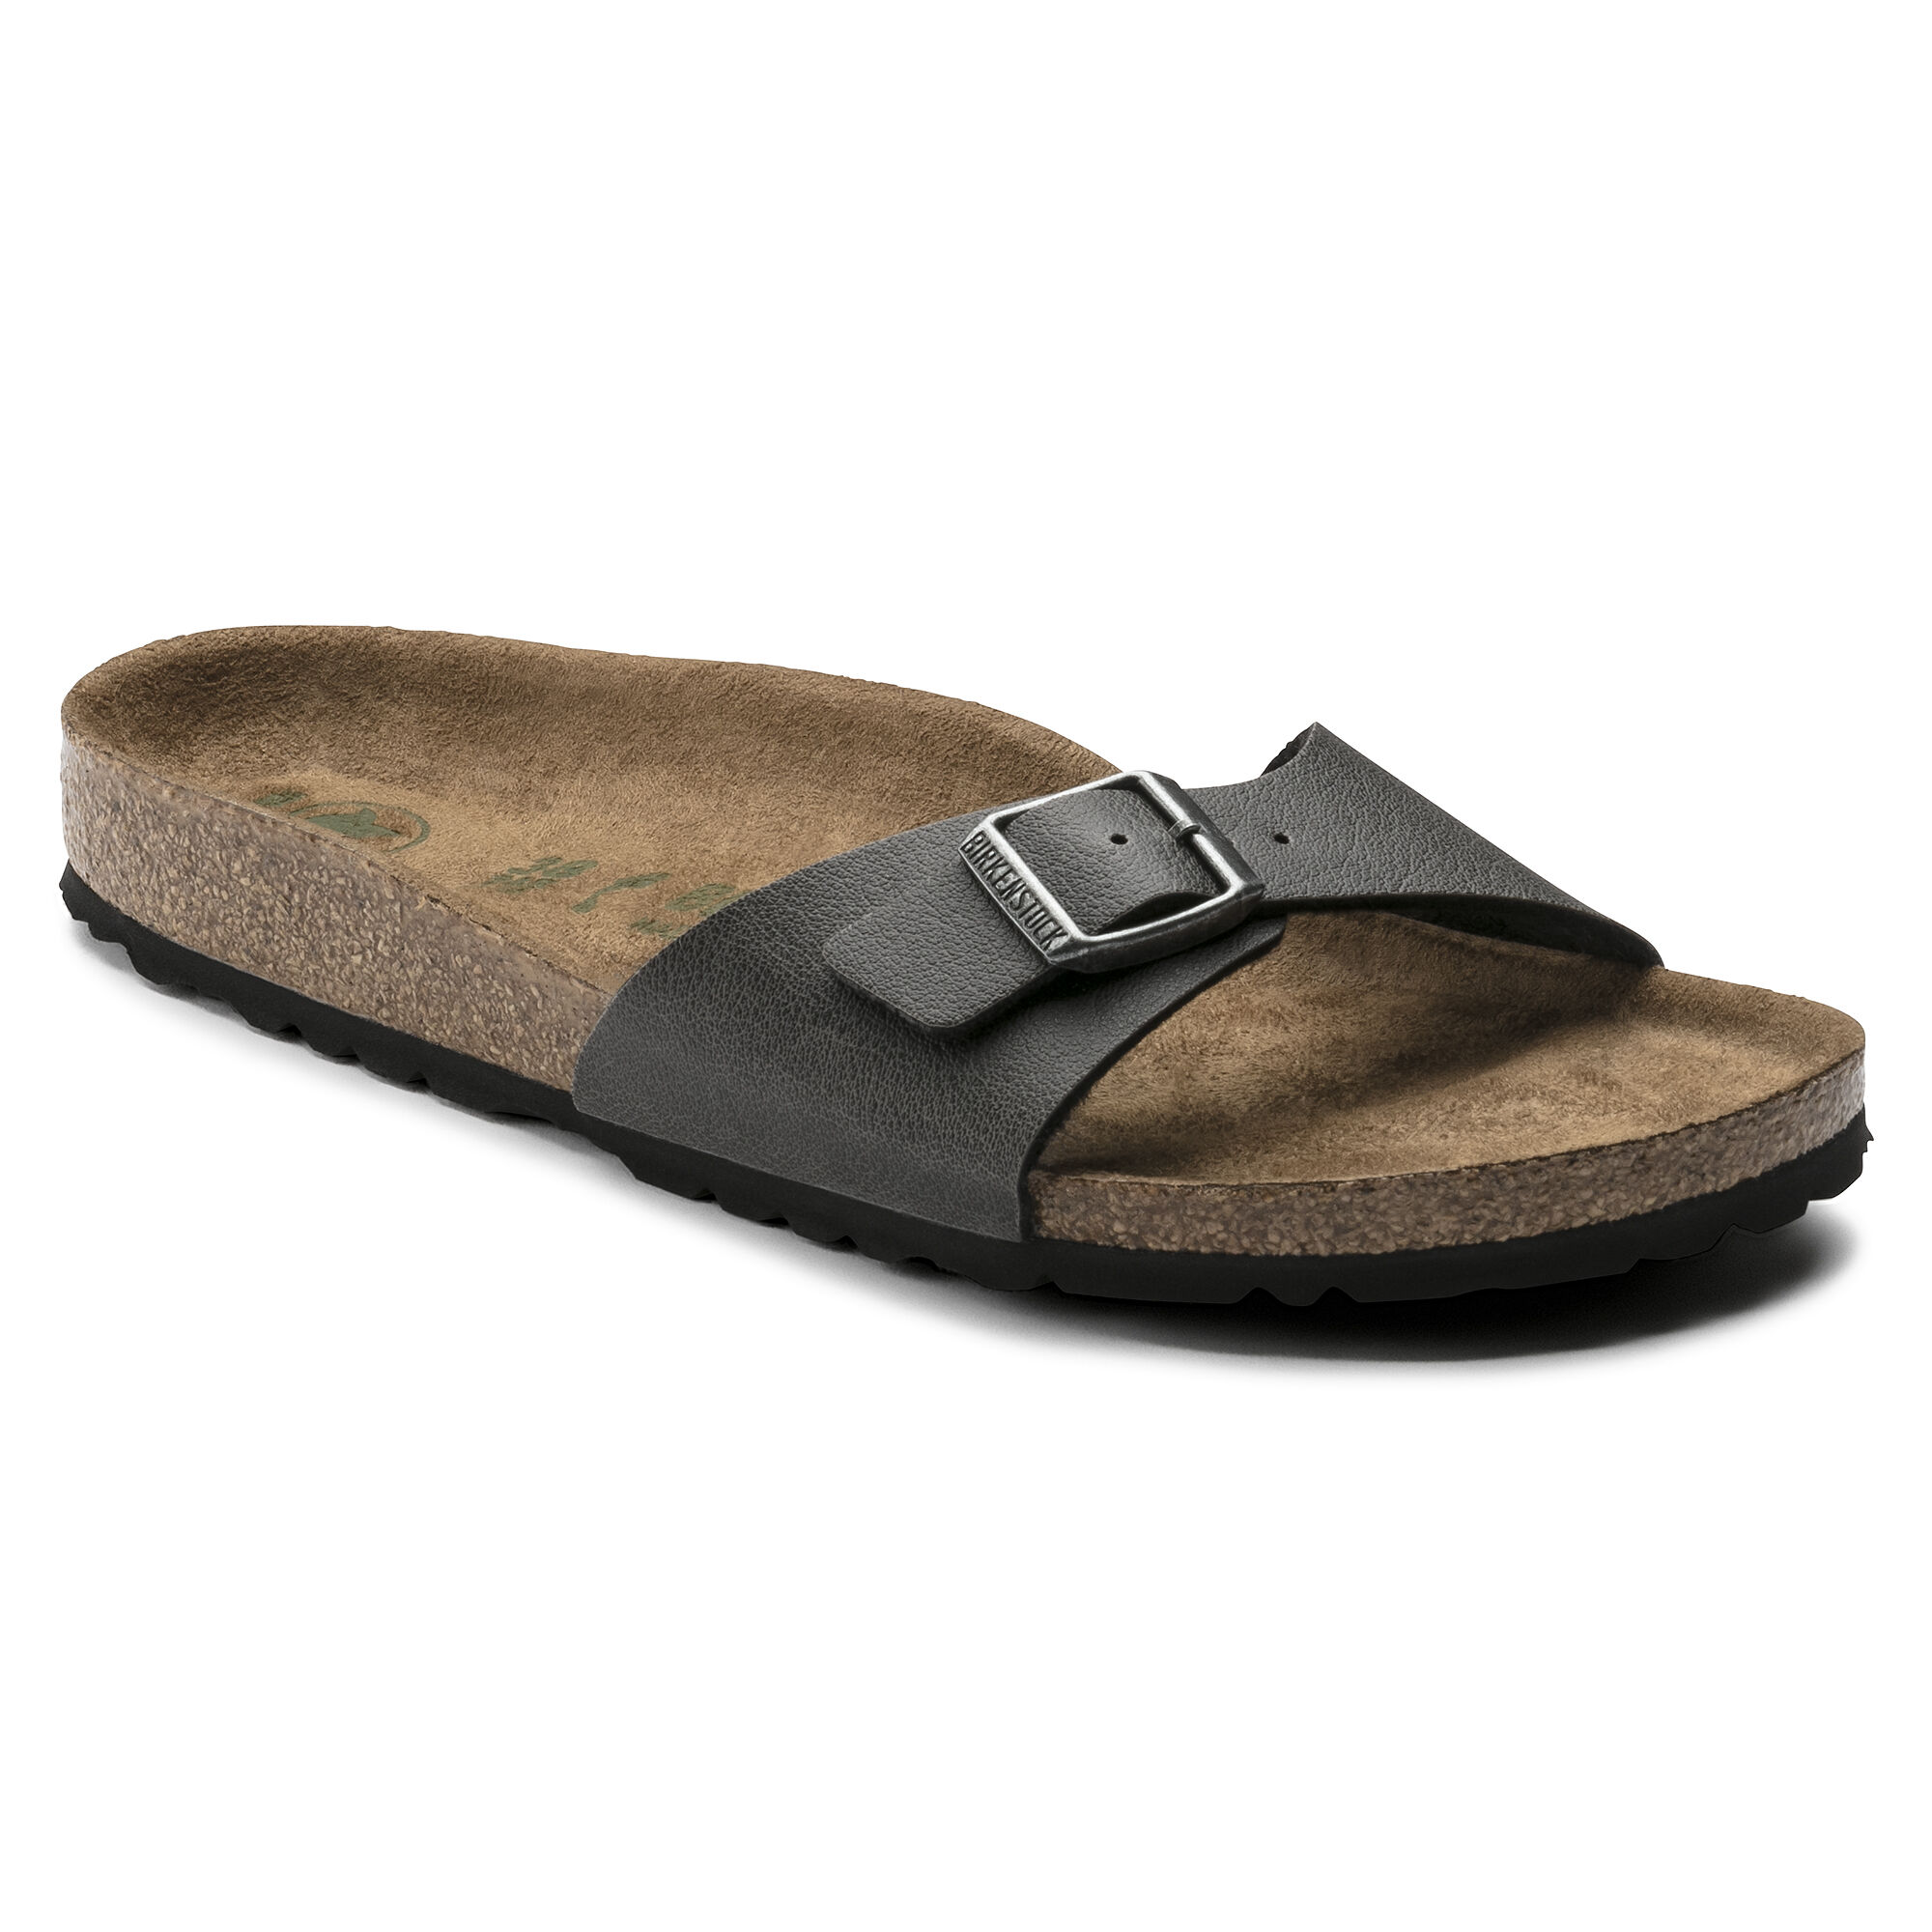 bronze Birkenstock Papillio shoe GIZEH SPECTRAL x5naye0mek